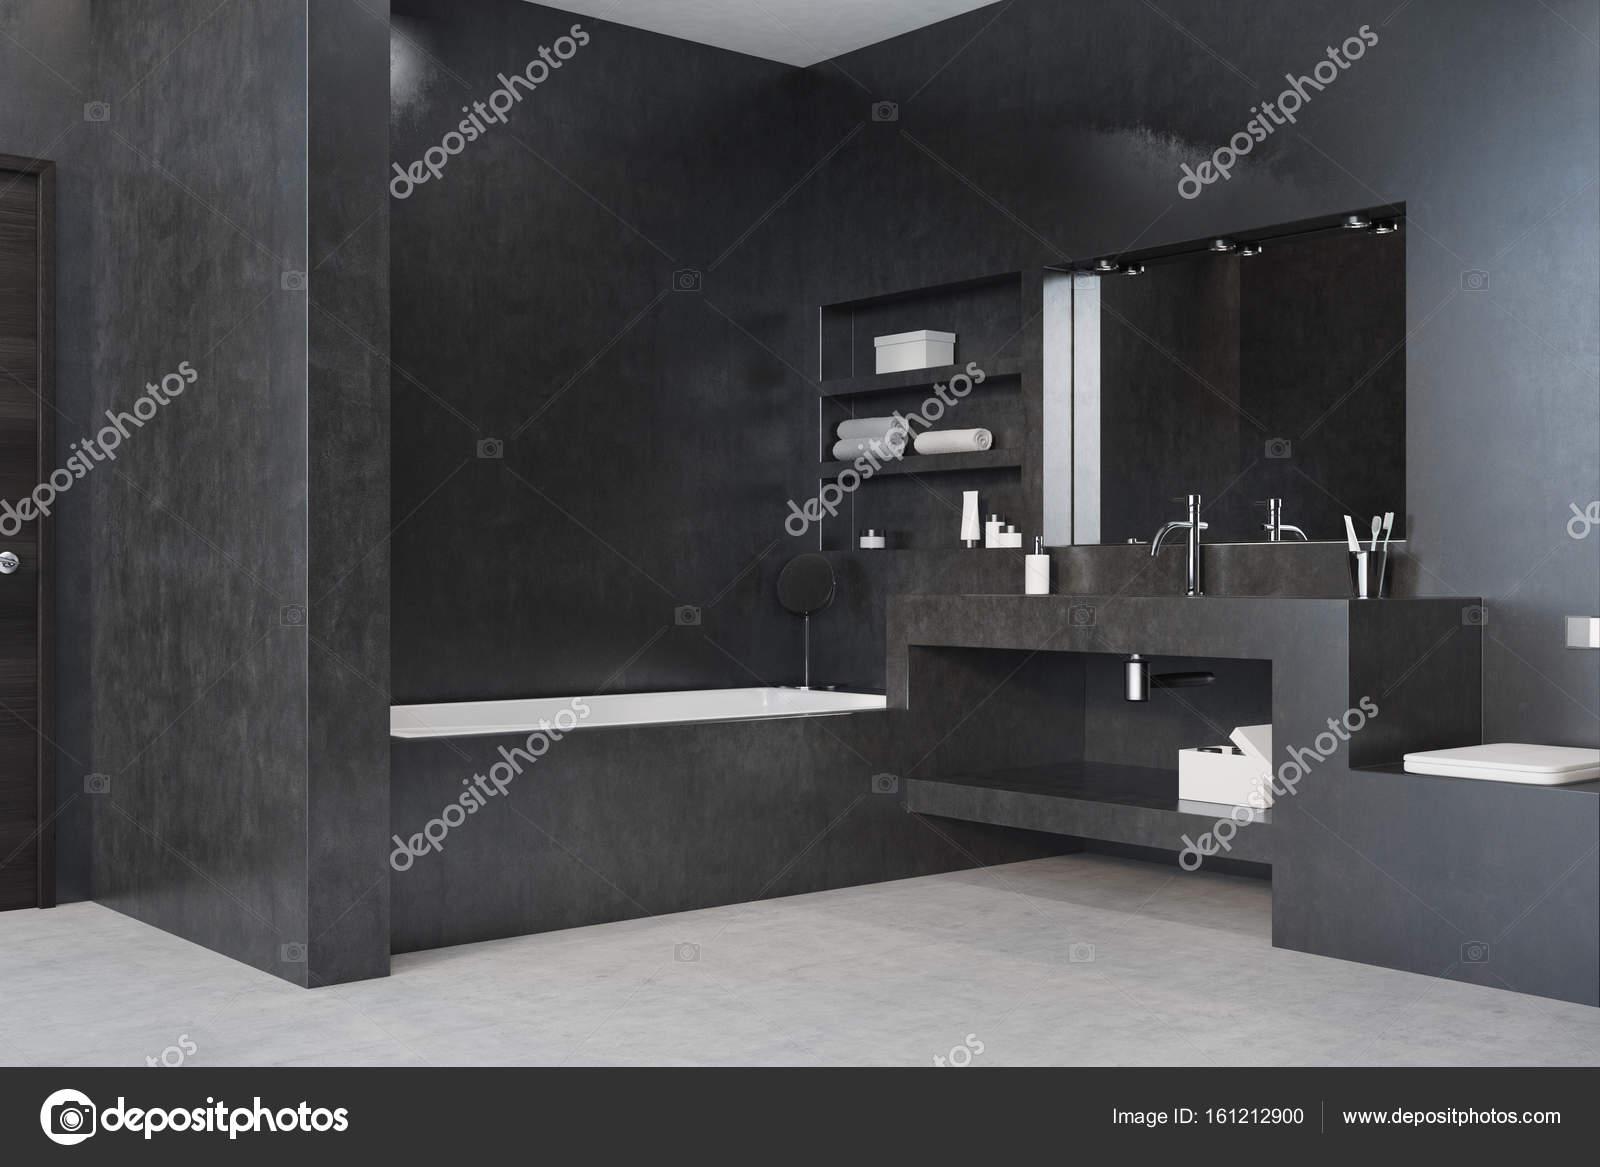 Zwarte badkamer, bad, wastafel en spiegel hoek — Stockfoto ...